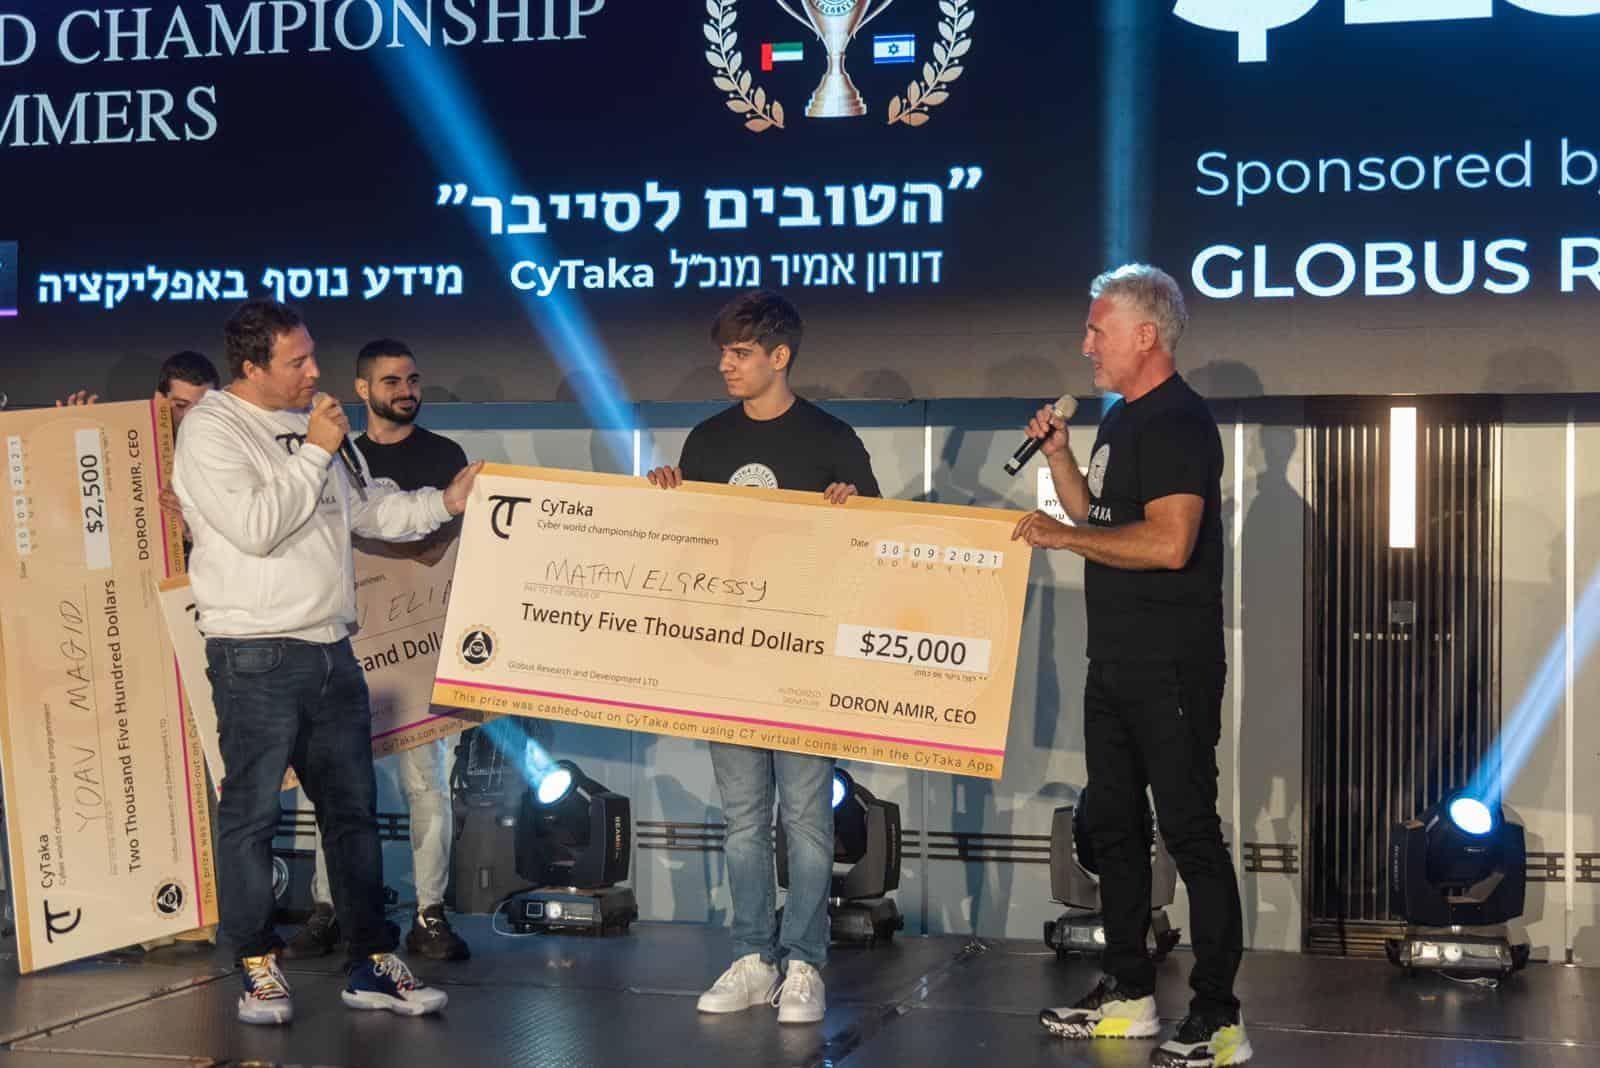 Matan Elgrasi Winning